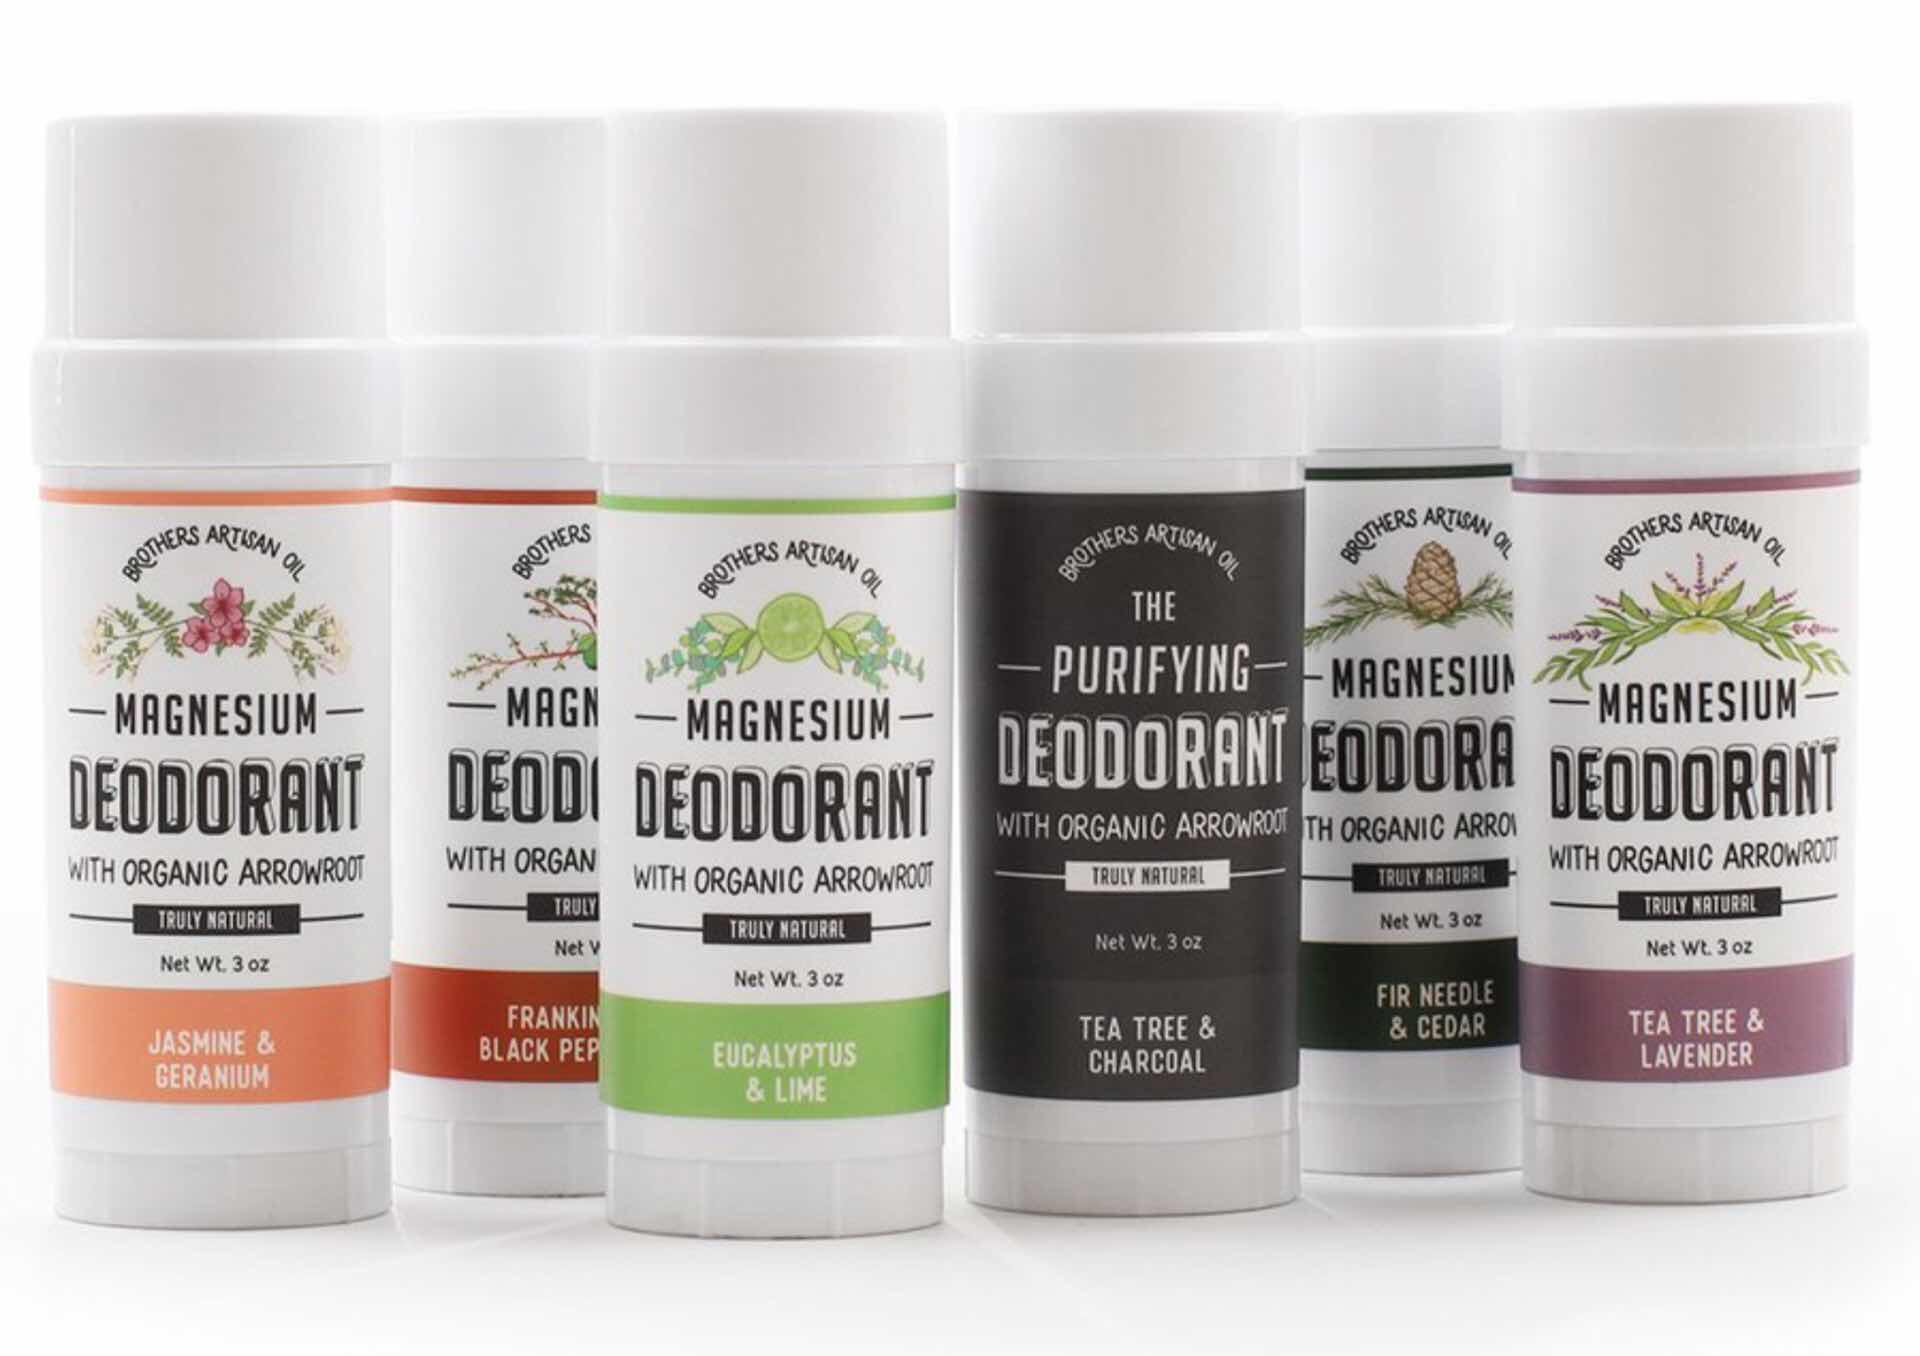 brothers-artisan-oil-all-natural-magnesium-deodorant